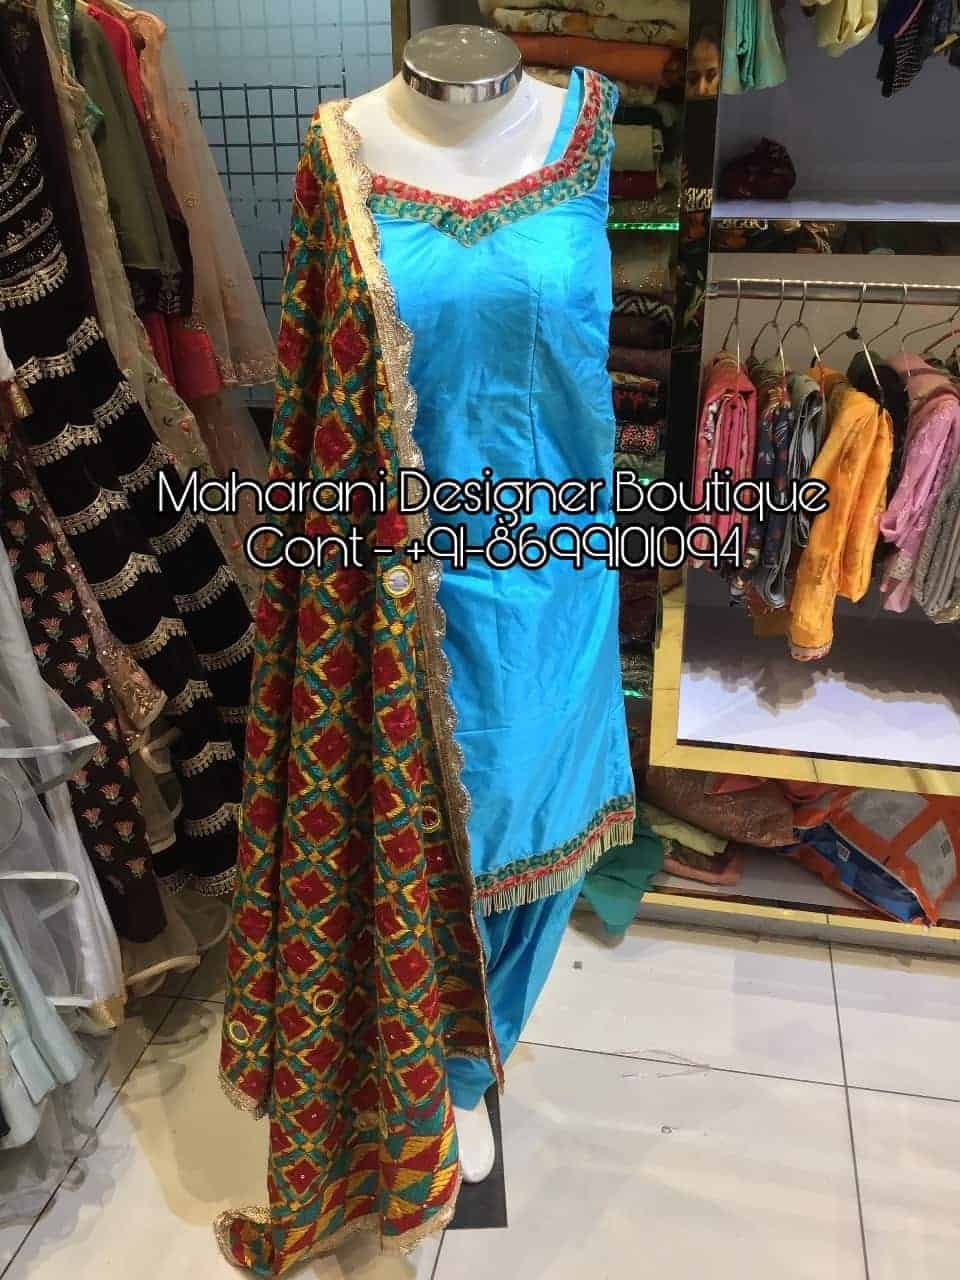 e70eff44d5 boutique salwar suits in pathankot, punjabi suit boutique in pathankot,  boutique of pathankot,